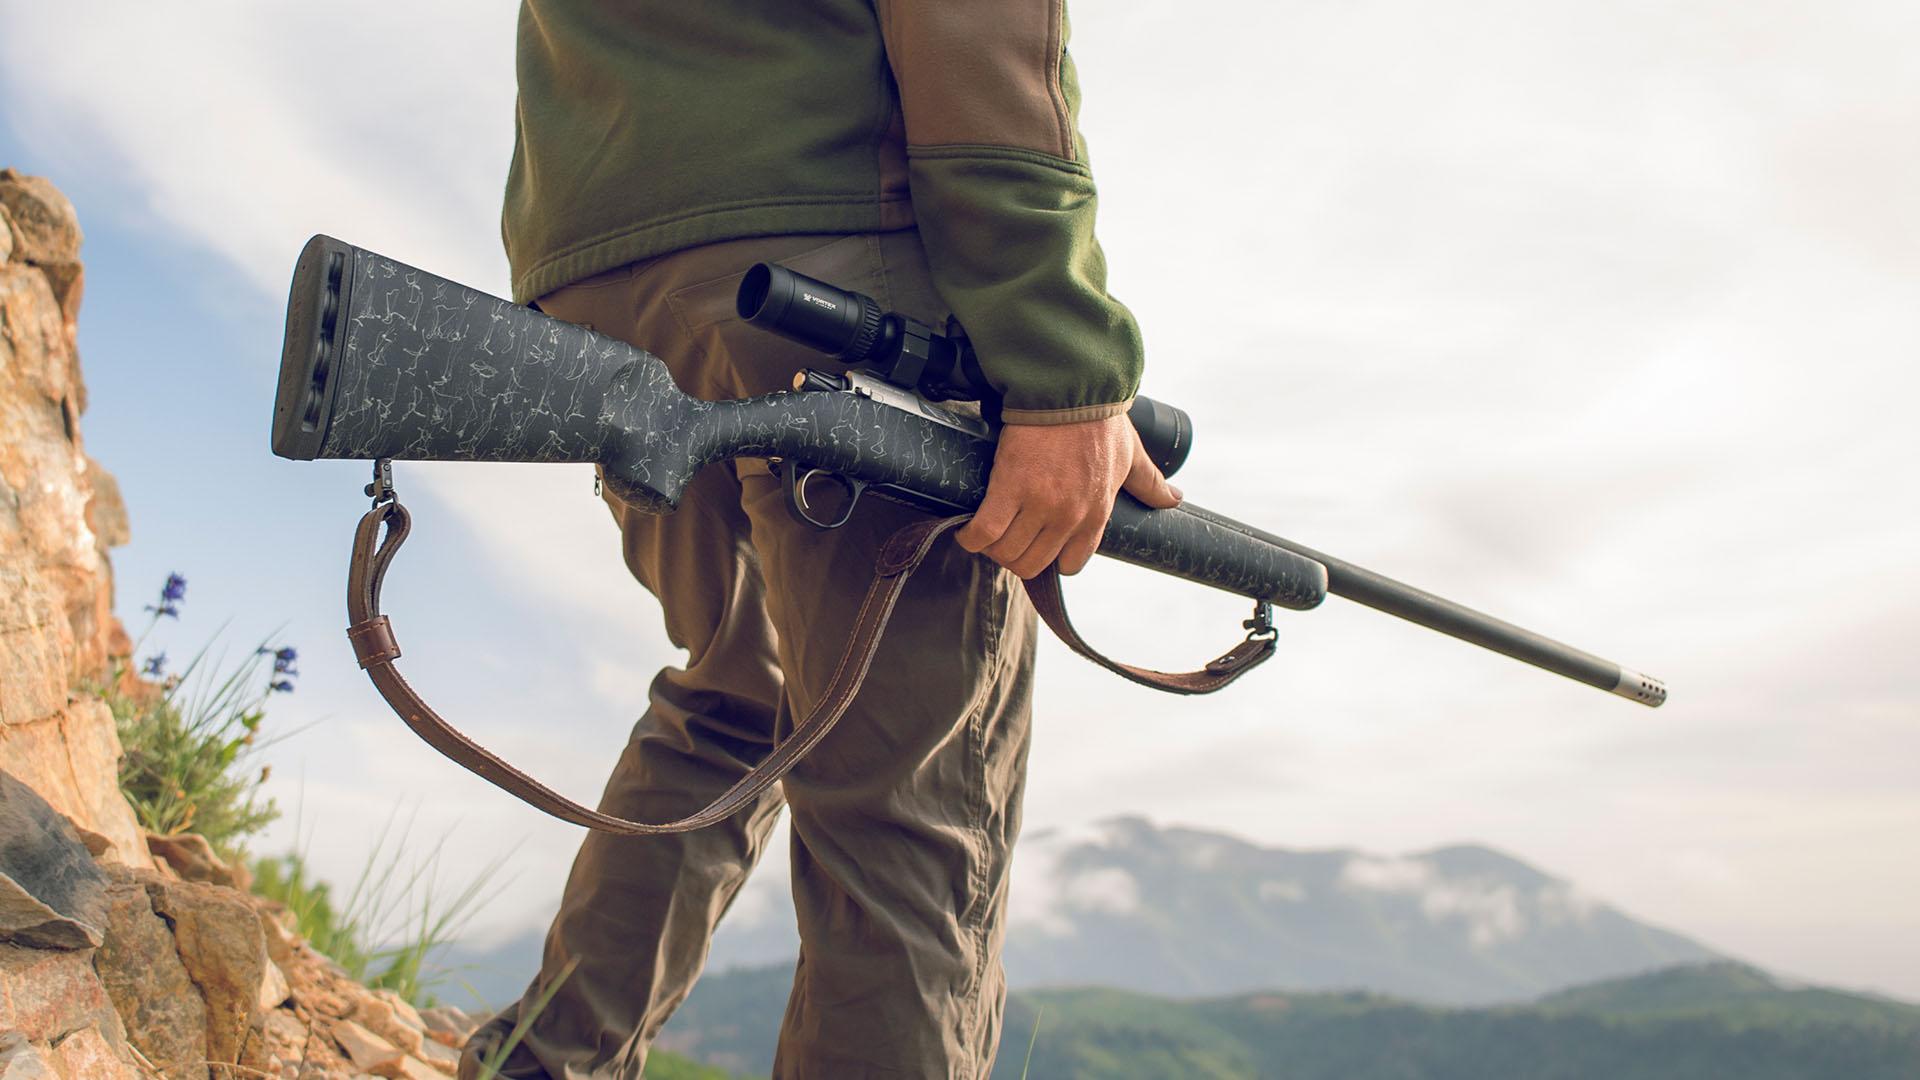 Christensen Arms Ridgeline - Bolt Action Rifle   6 3 LBS, MSRP $1,995